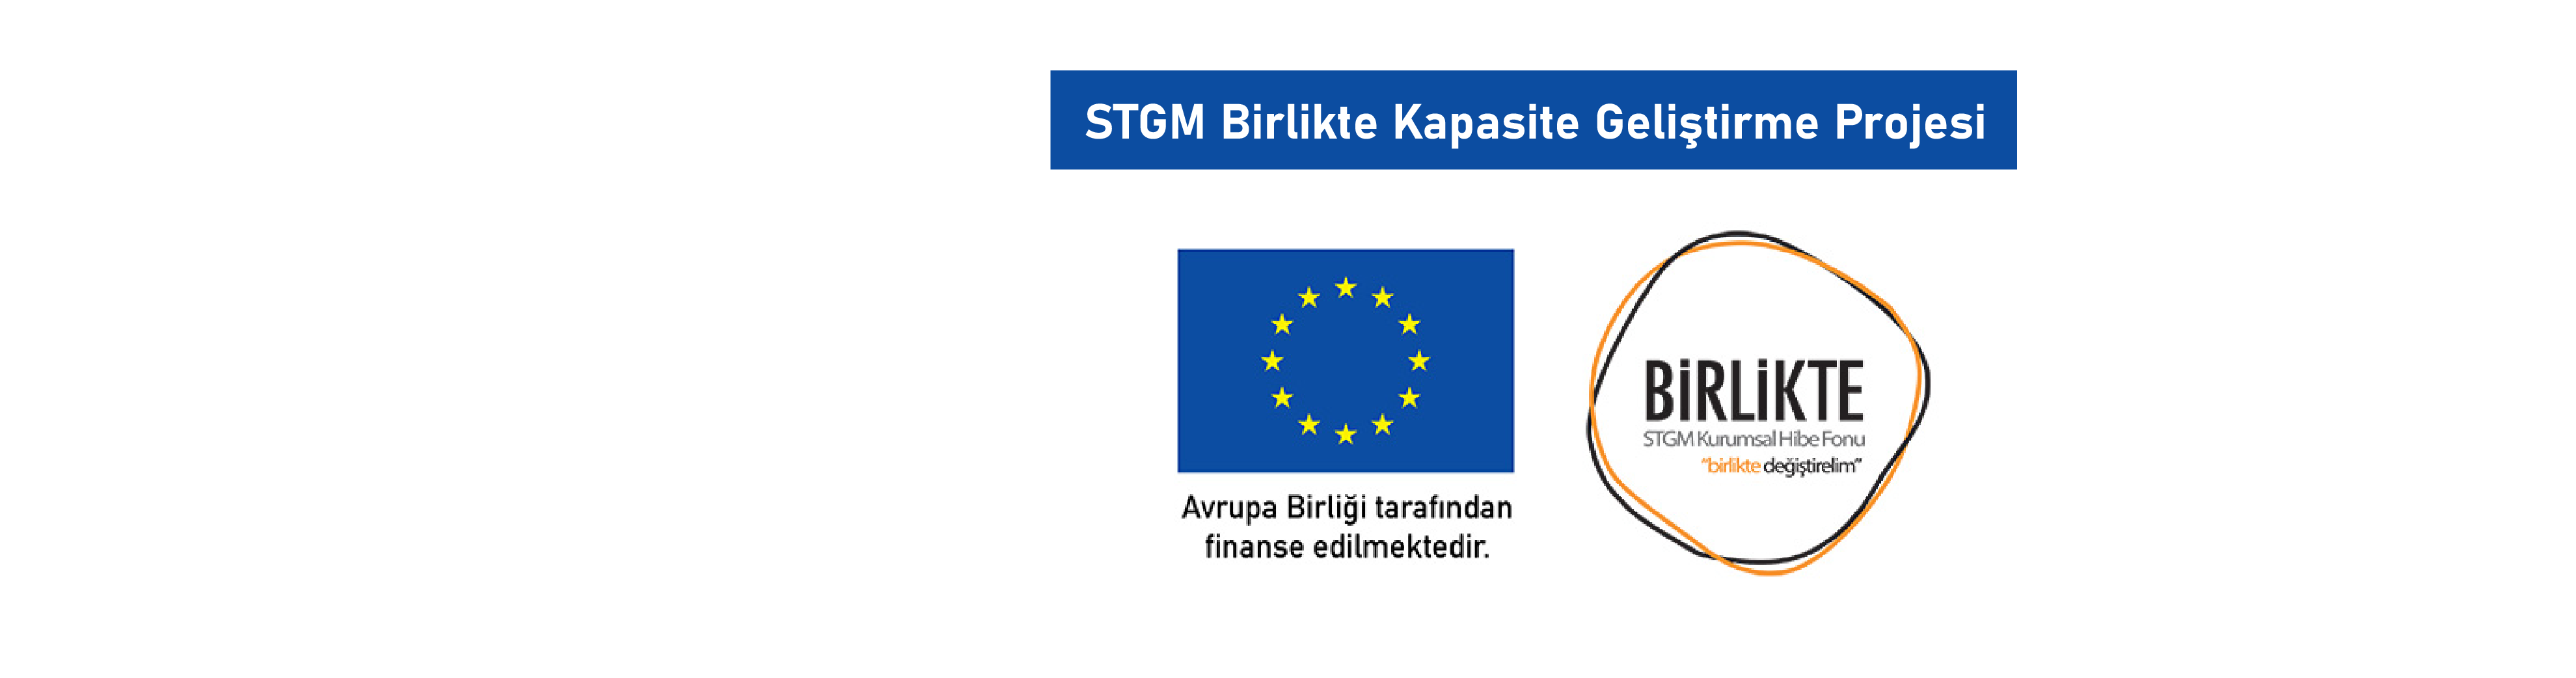 stgm_Çalışma Yüzeyi 1